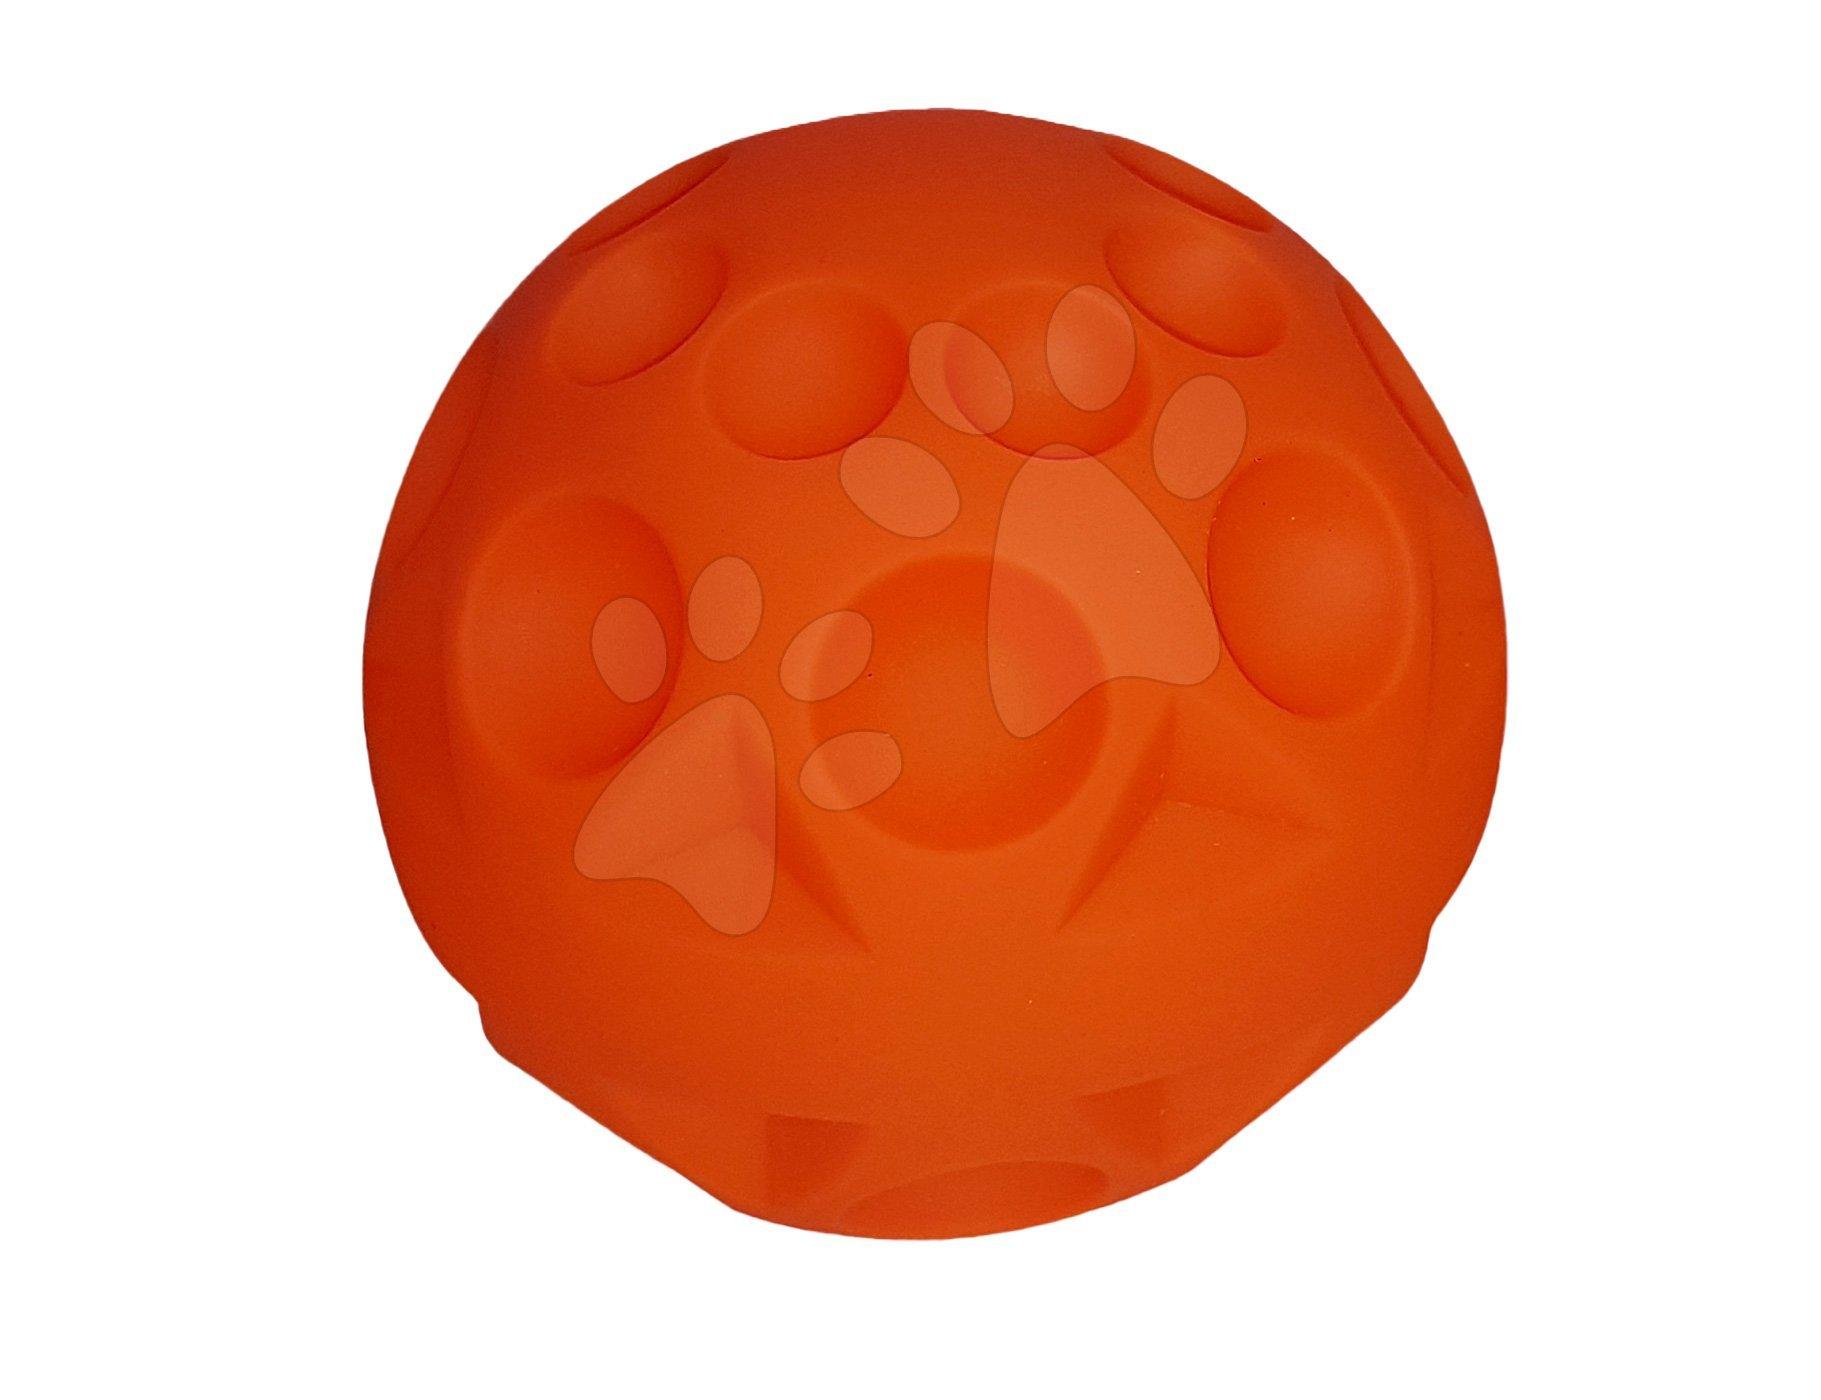 Vývoj motoriky - Oranžová lopta s reliéfovým vzorom Shelcore